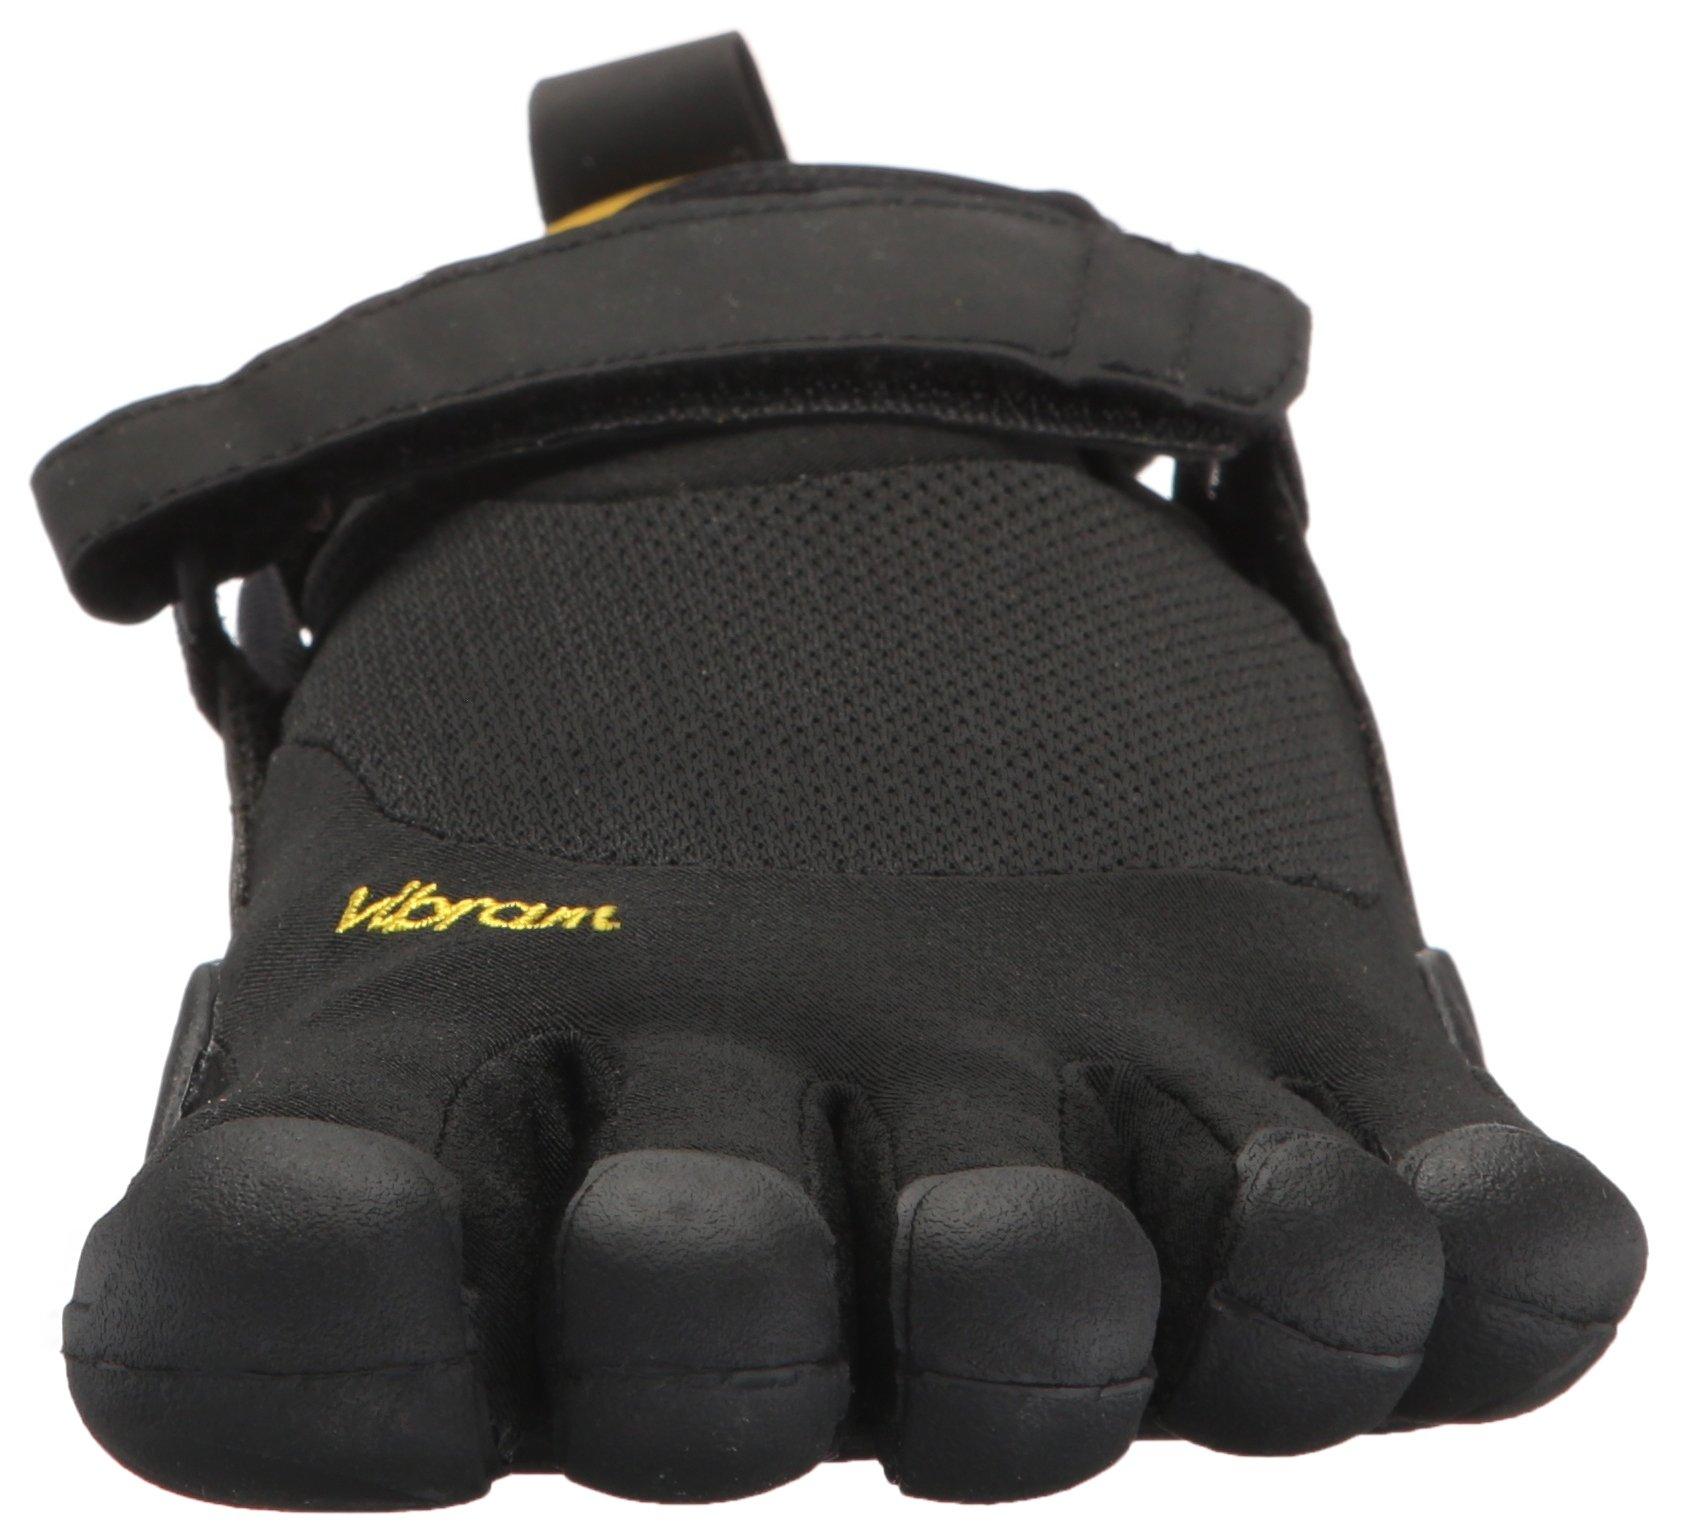 Vibram Men's Five Fingers, KSO EVO Cross Training Shoe Black Black 4.4 M by Vibram (Image #4)